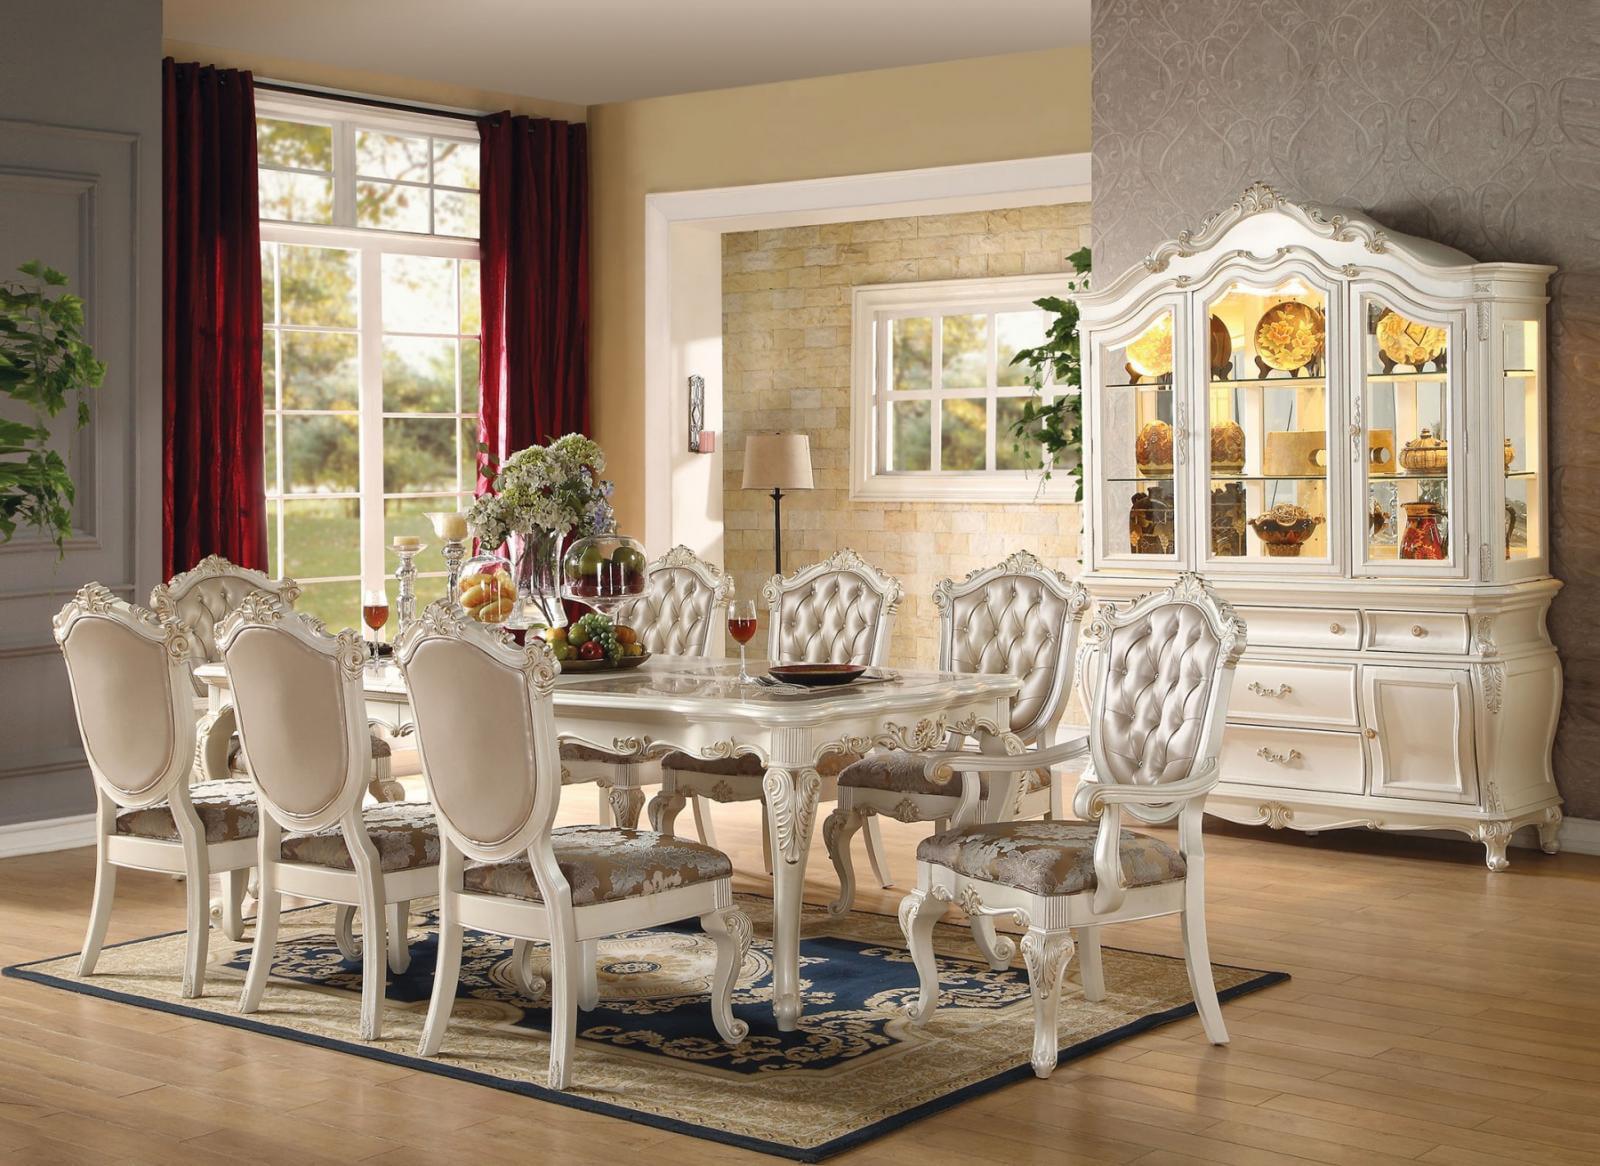 Marble & Pearl White Dining Room Set 5Pcs Acme Furniture 63540 Chantelle - Walmart.com - Walmart.com